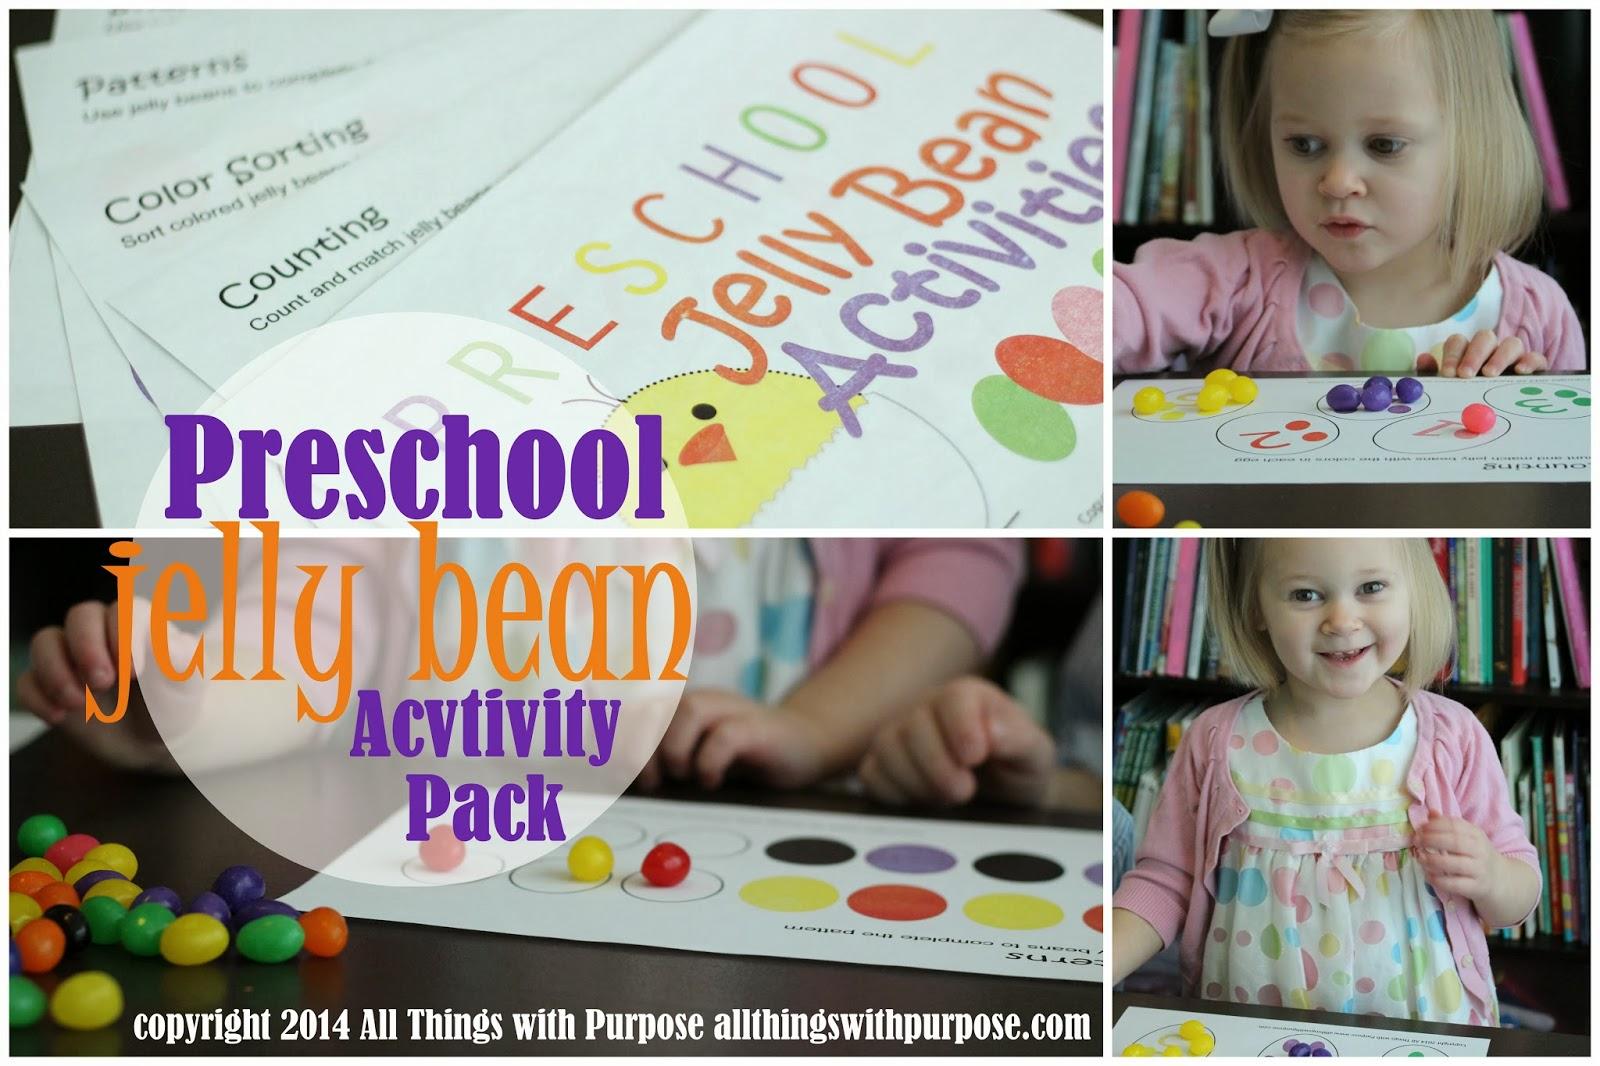 National Jelly Bean Day: Preschool Activity